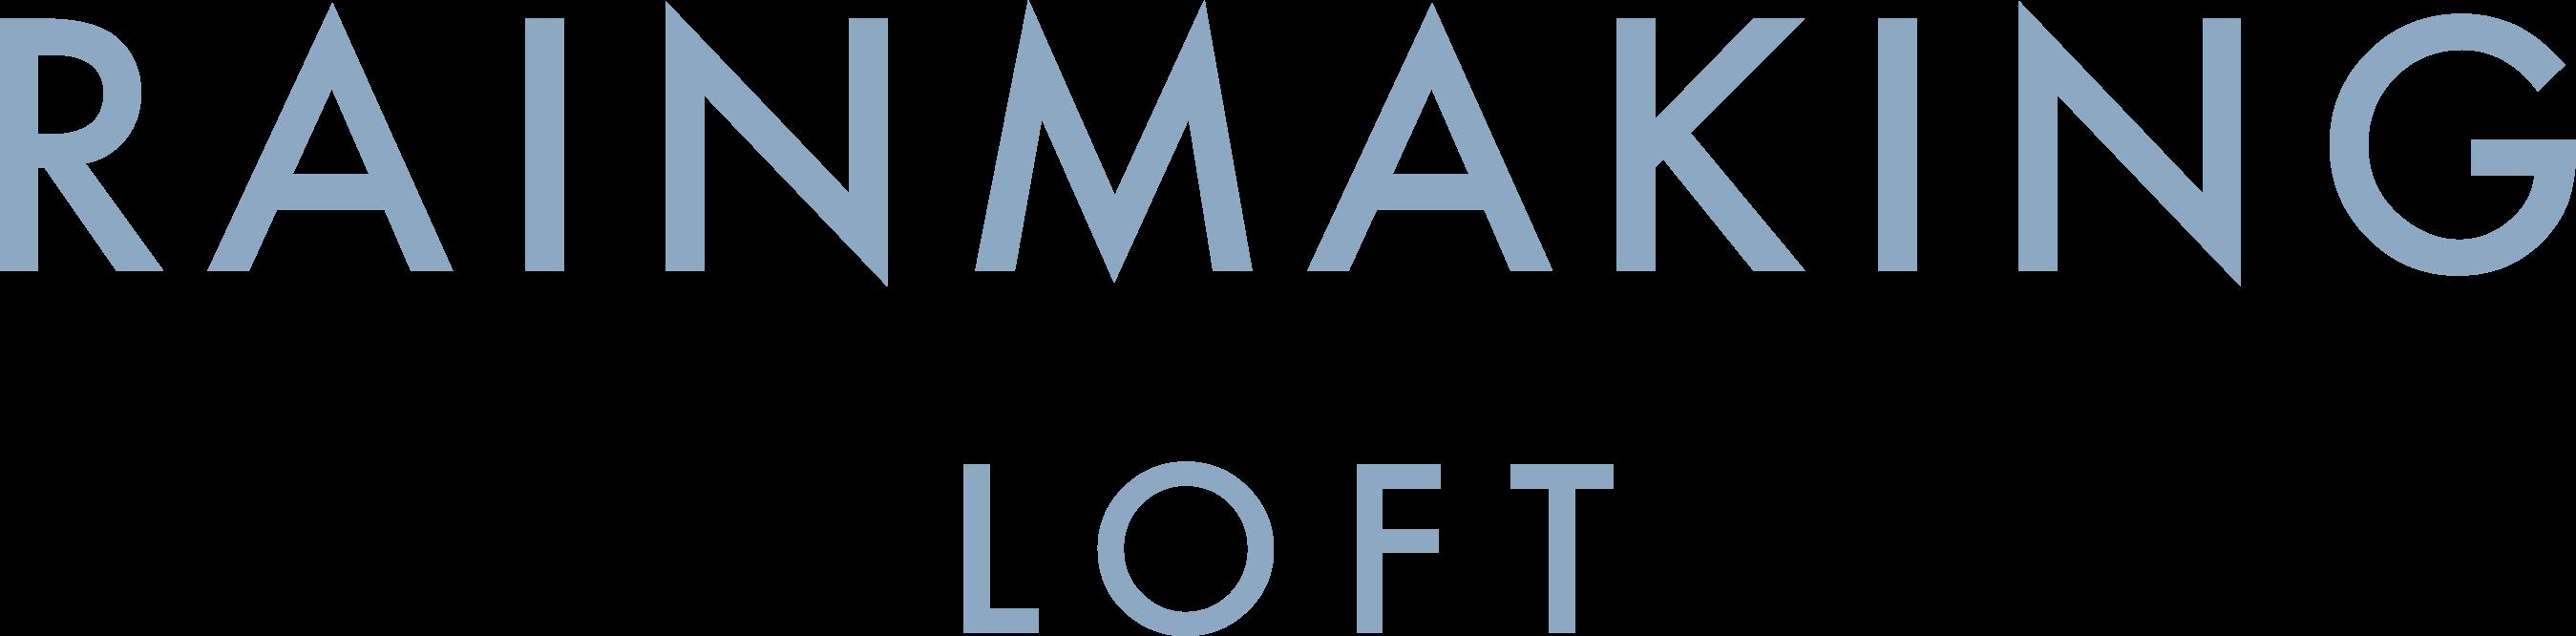 rainmaking_loft - Logo (1) copy.png